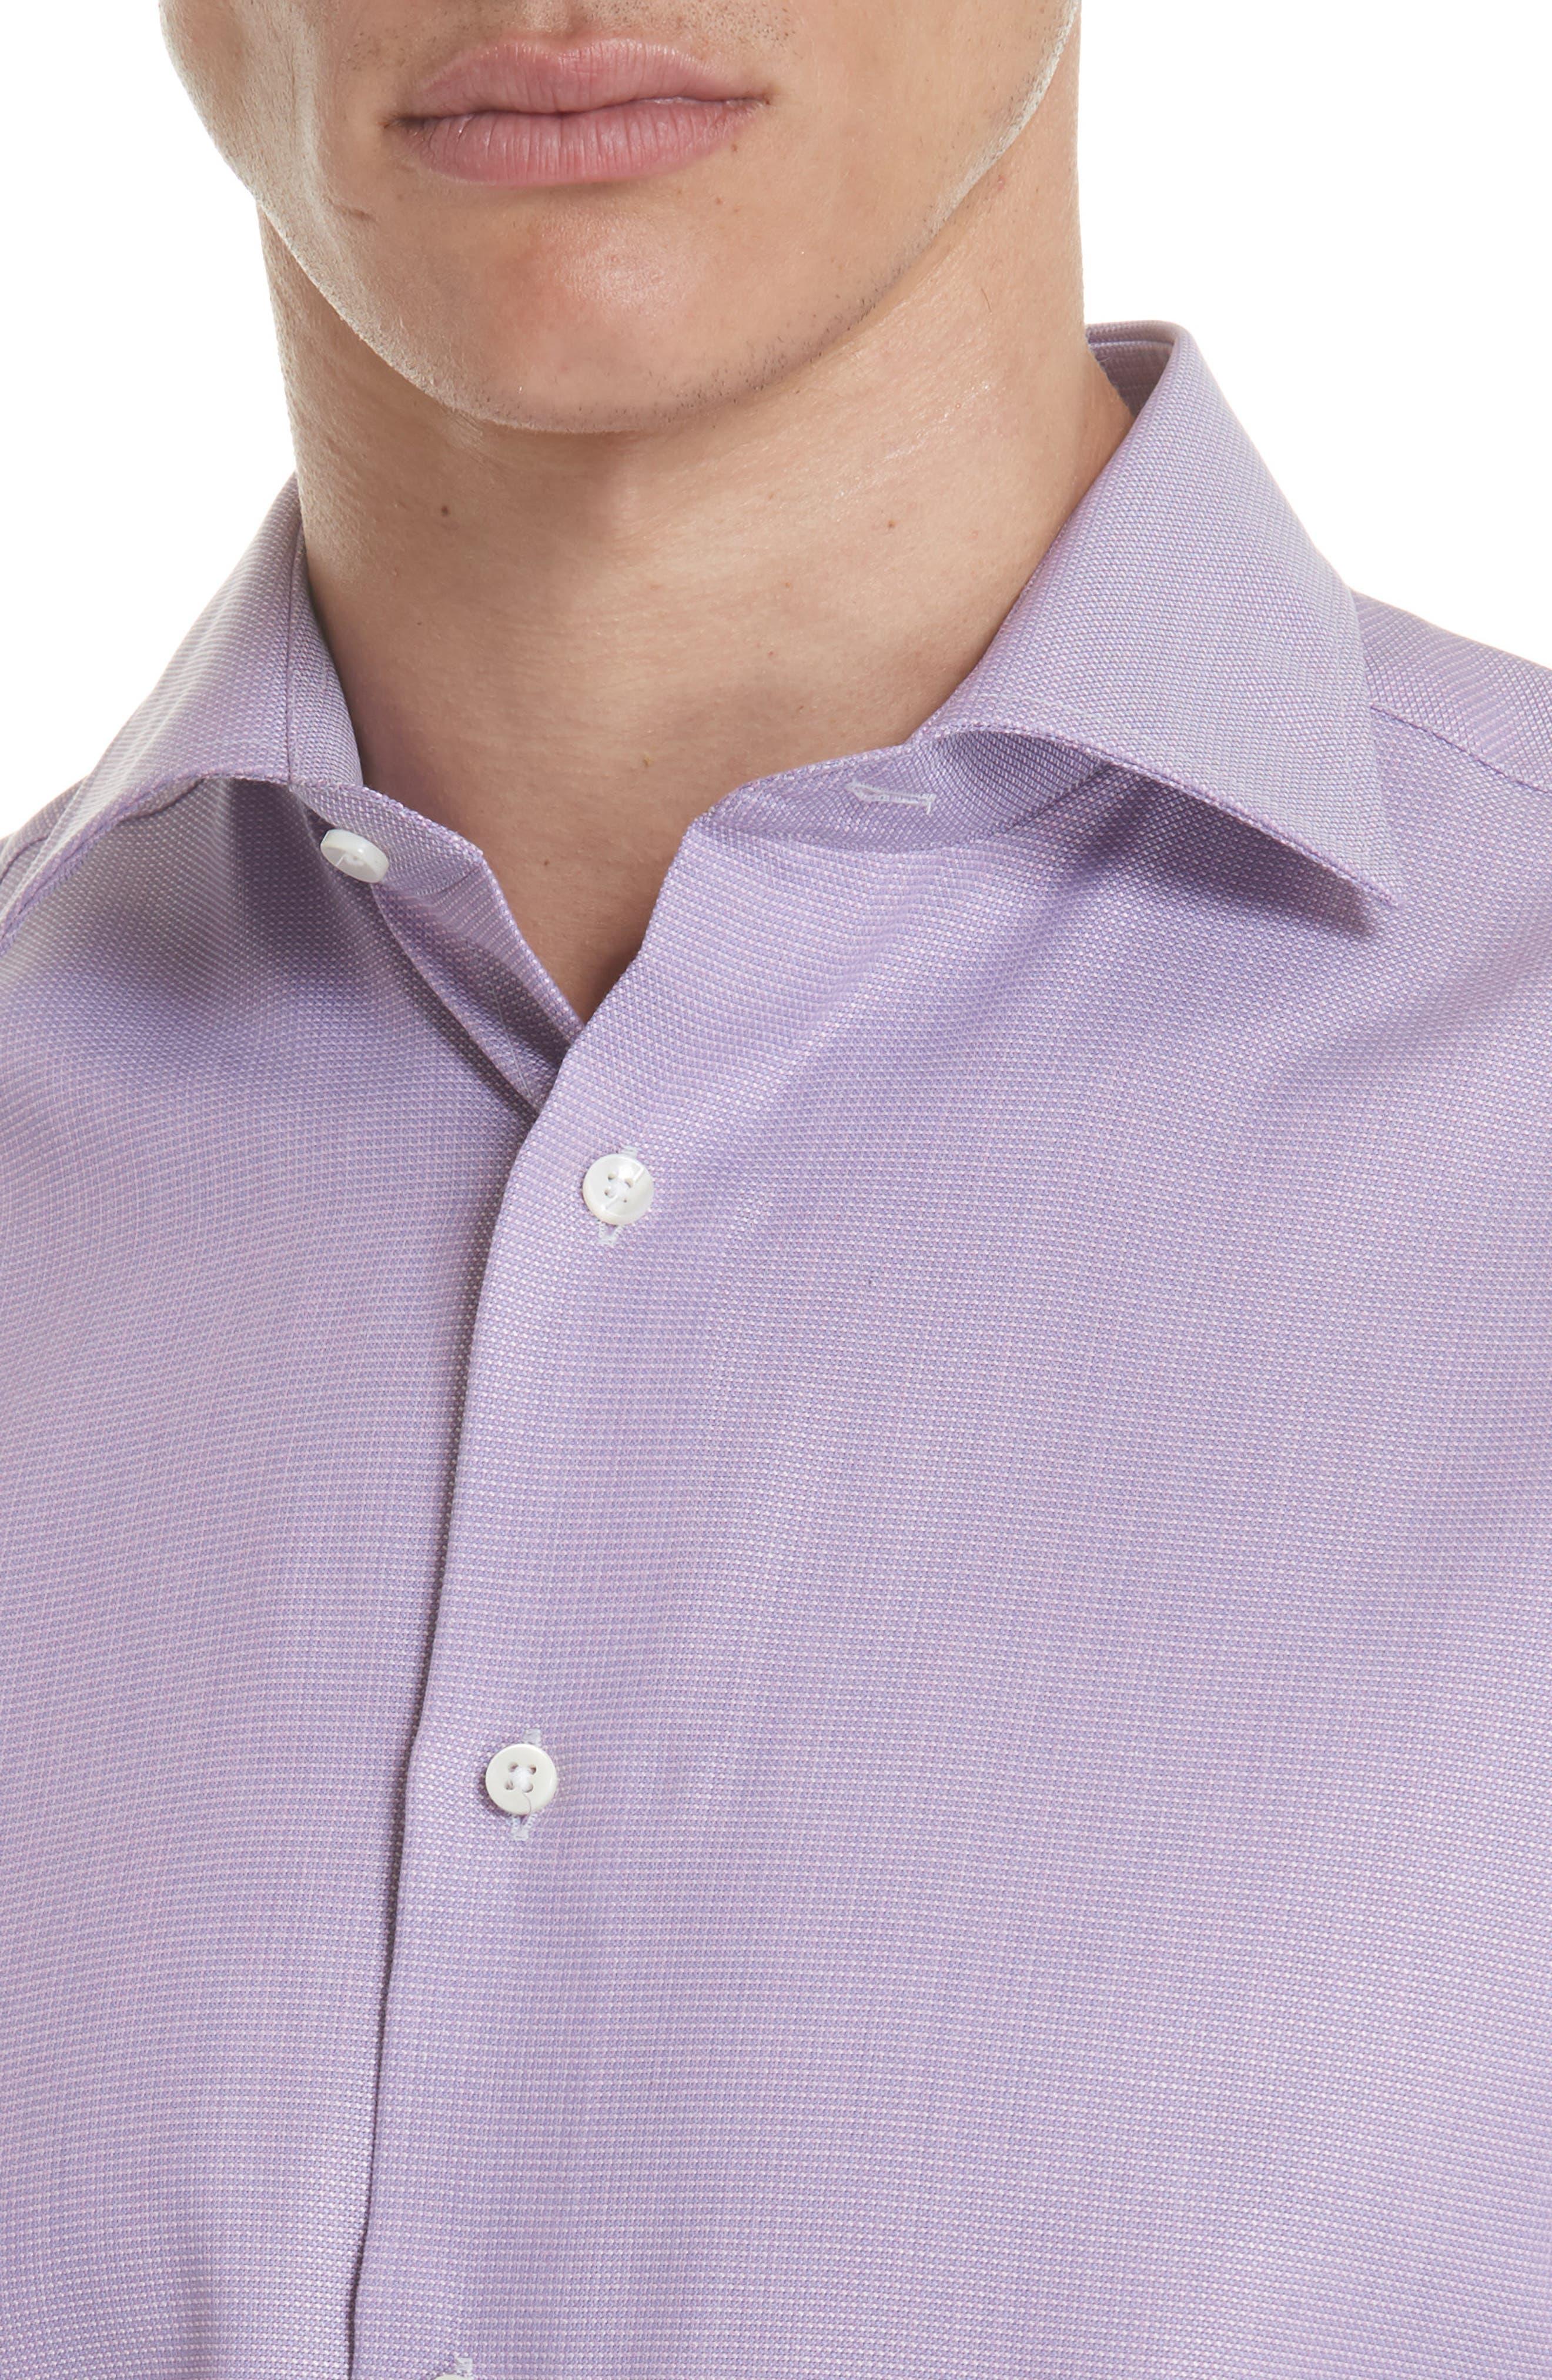 Regular Fit Solid Dress Shirt,                             Alternate thumbnail 2, color,                             520